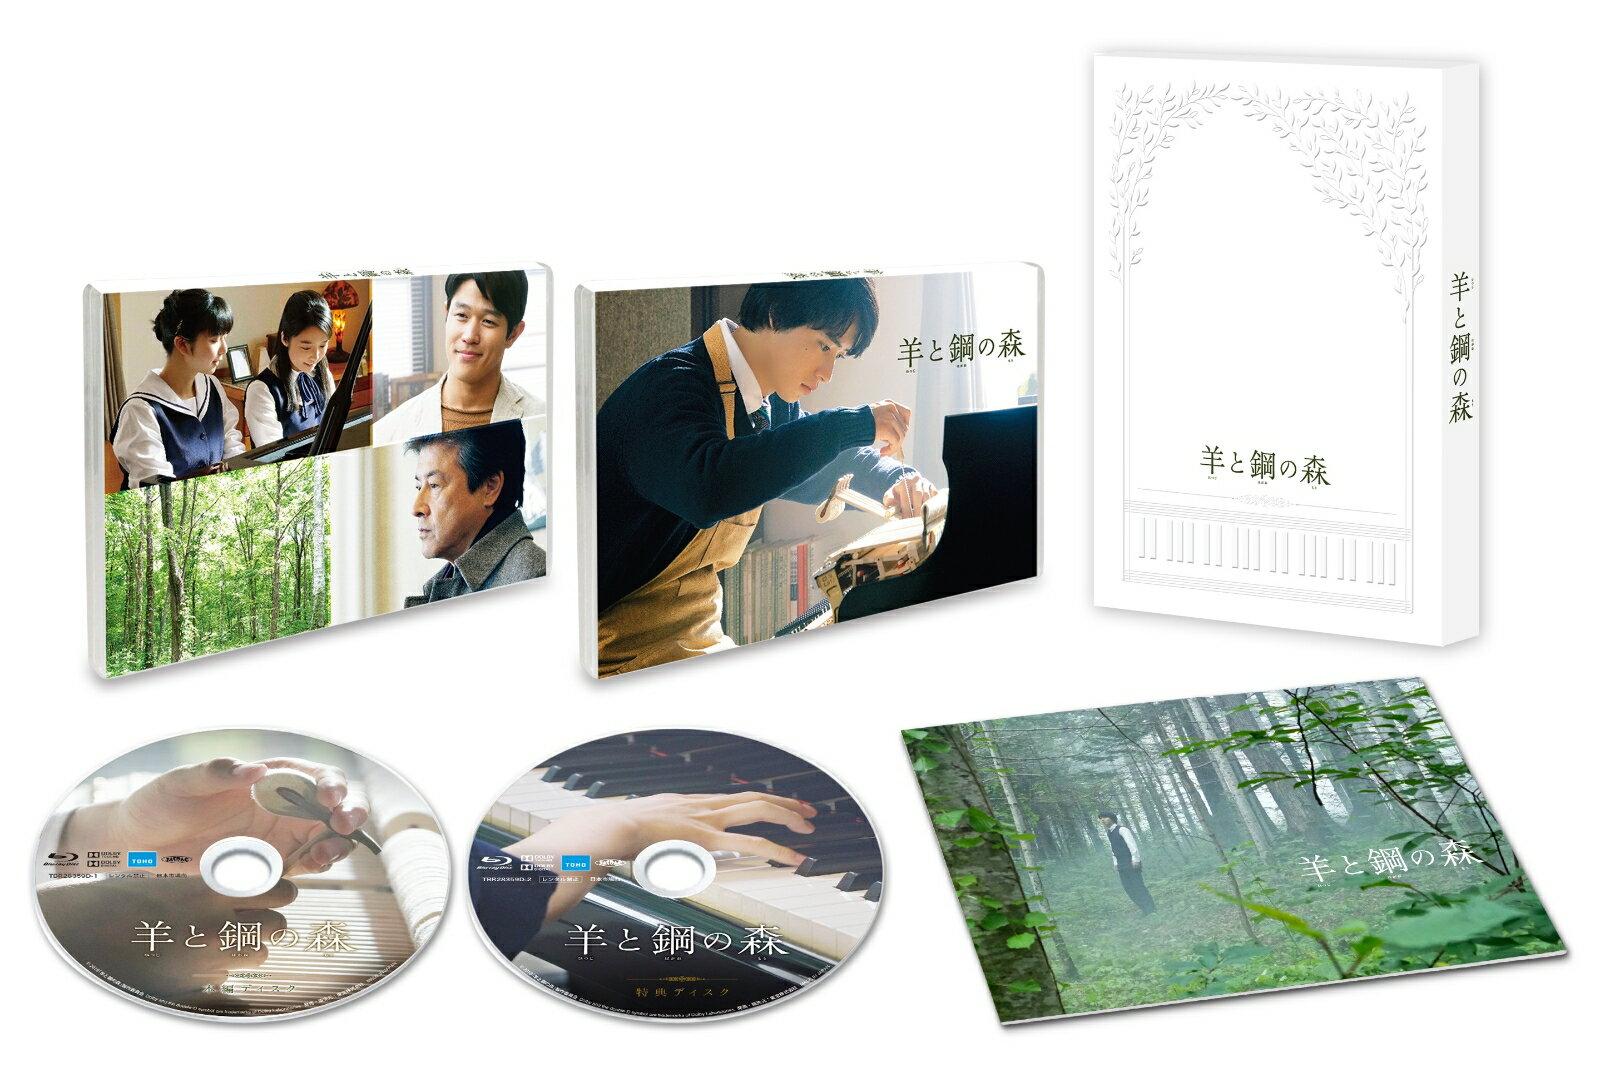 羊と鋼の森 Blu-ray 豪華版【Blu-ray】